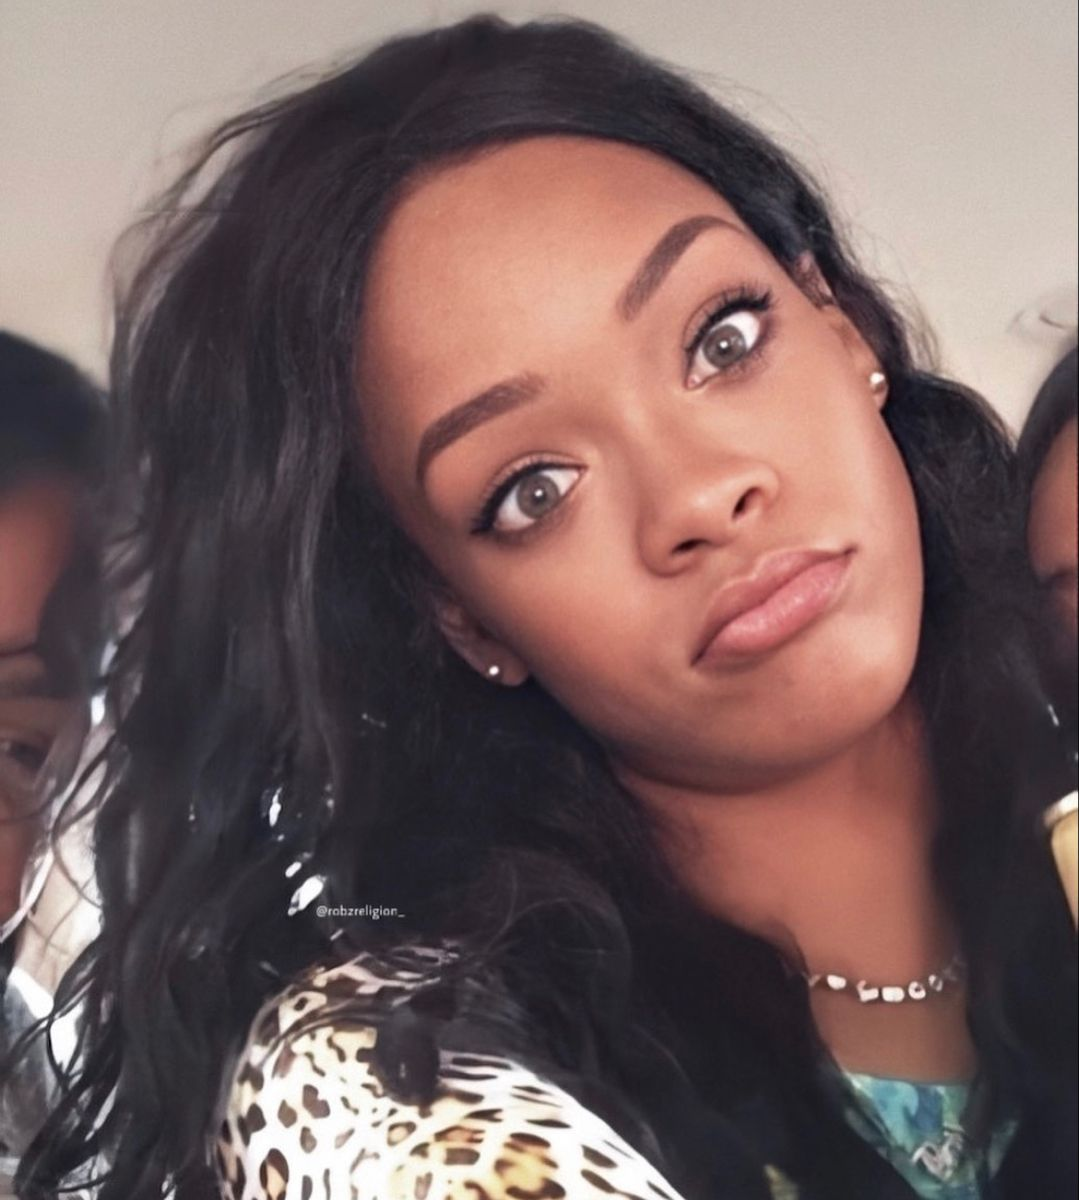 Me Where Is The R9 Riri I Can T Find It In 2020 Rihanna Face Rihanna Riri Best Of Rihanna